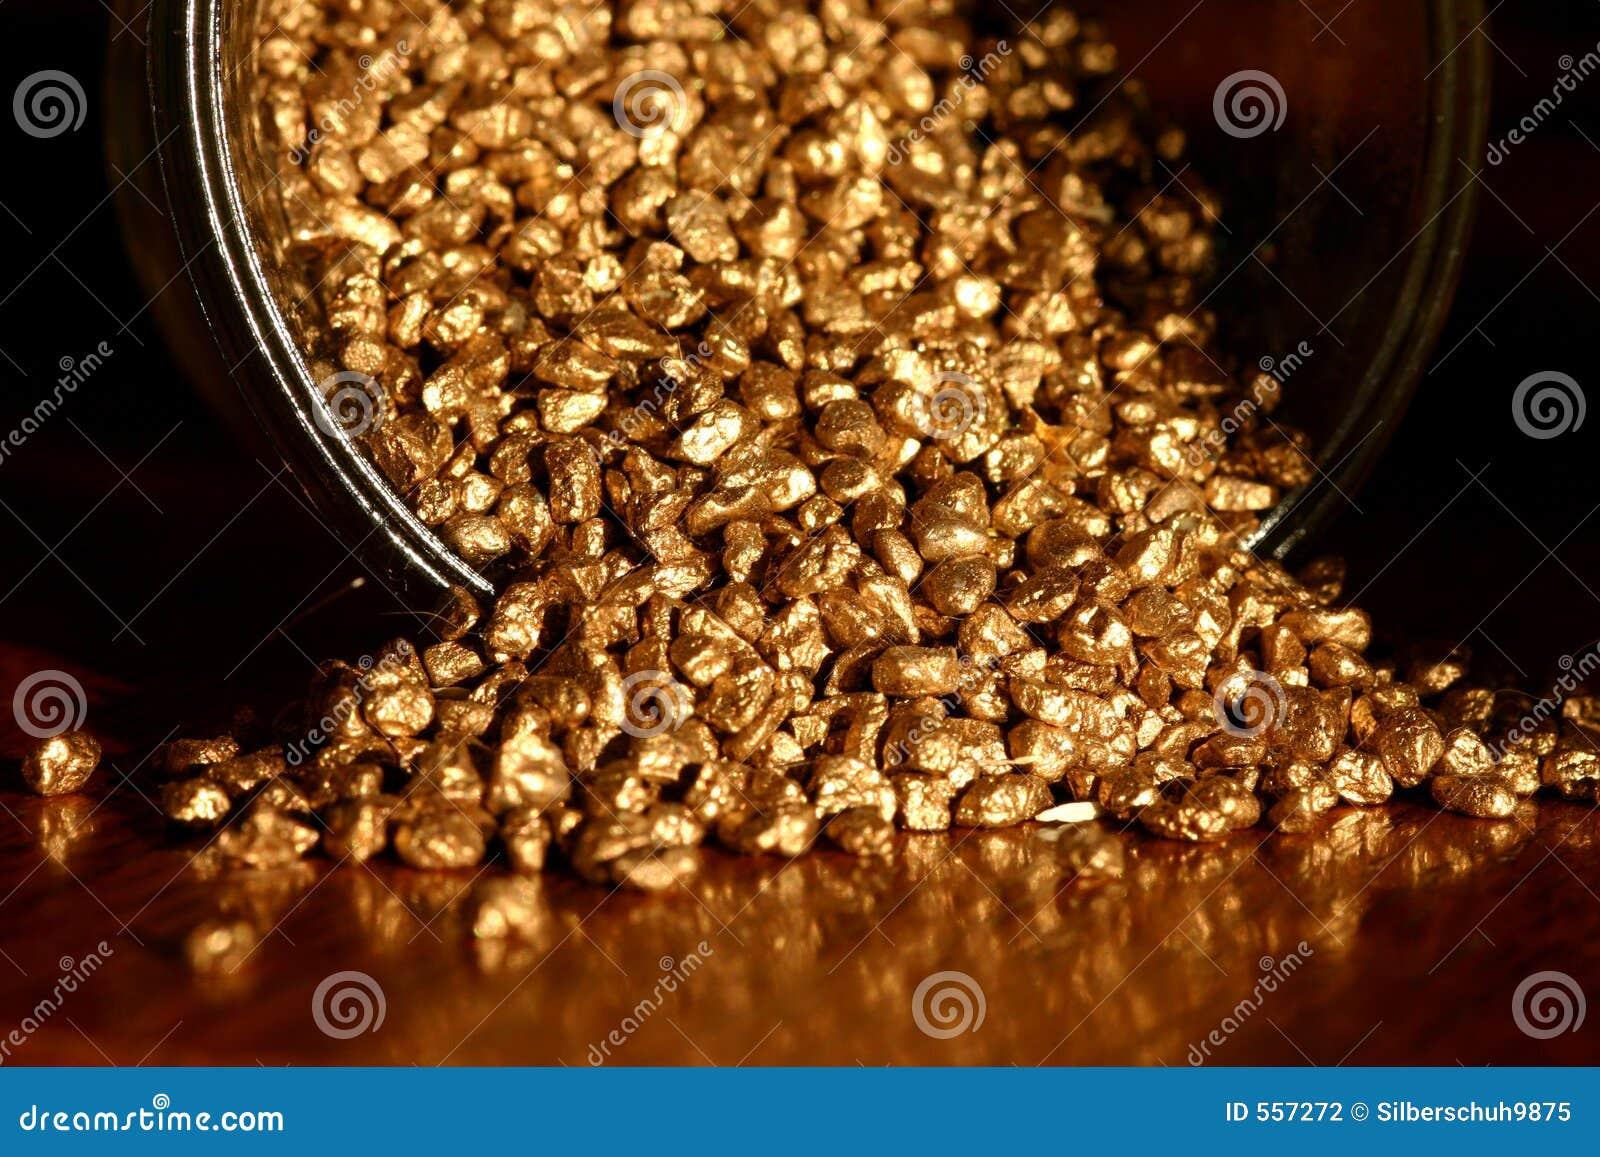 Pot Of Gold Stock Photo  Image Of Symbol  Golden